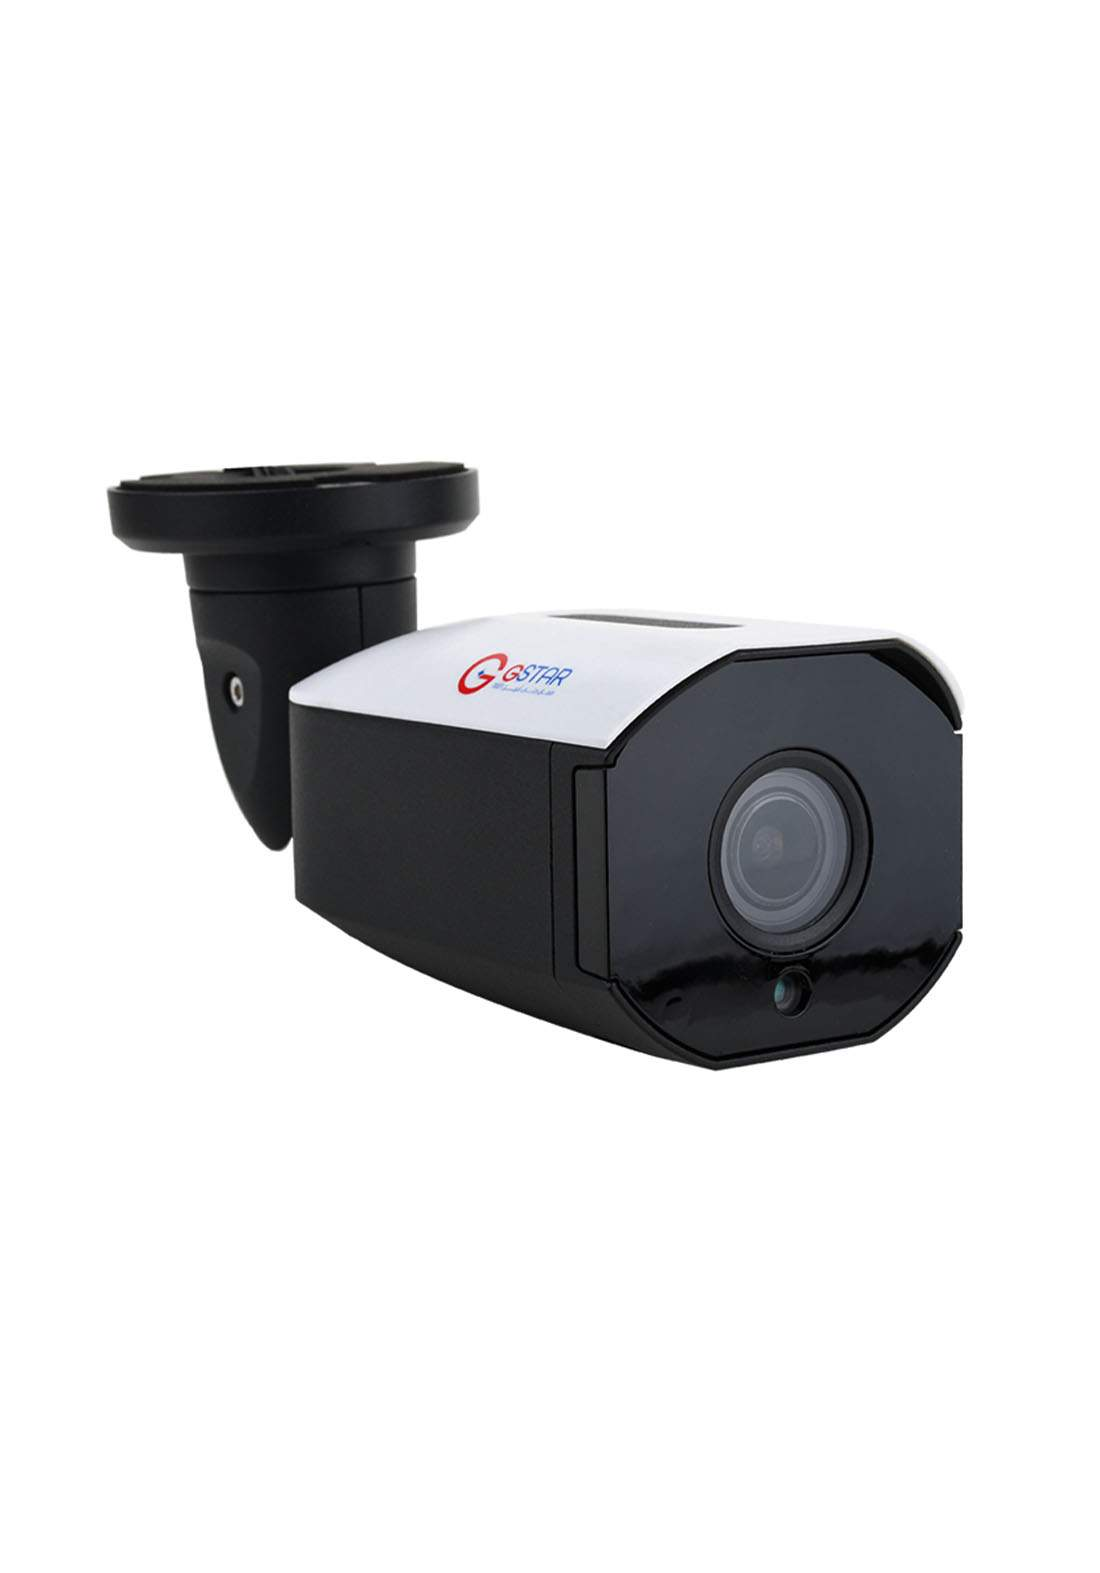 Gstar Analog High Definition Camera AHD 4MP 4-in-1 - White كاميرا مراقبة